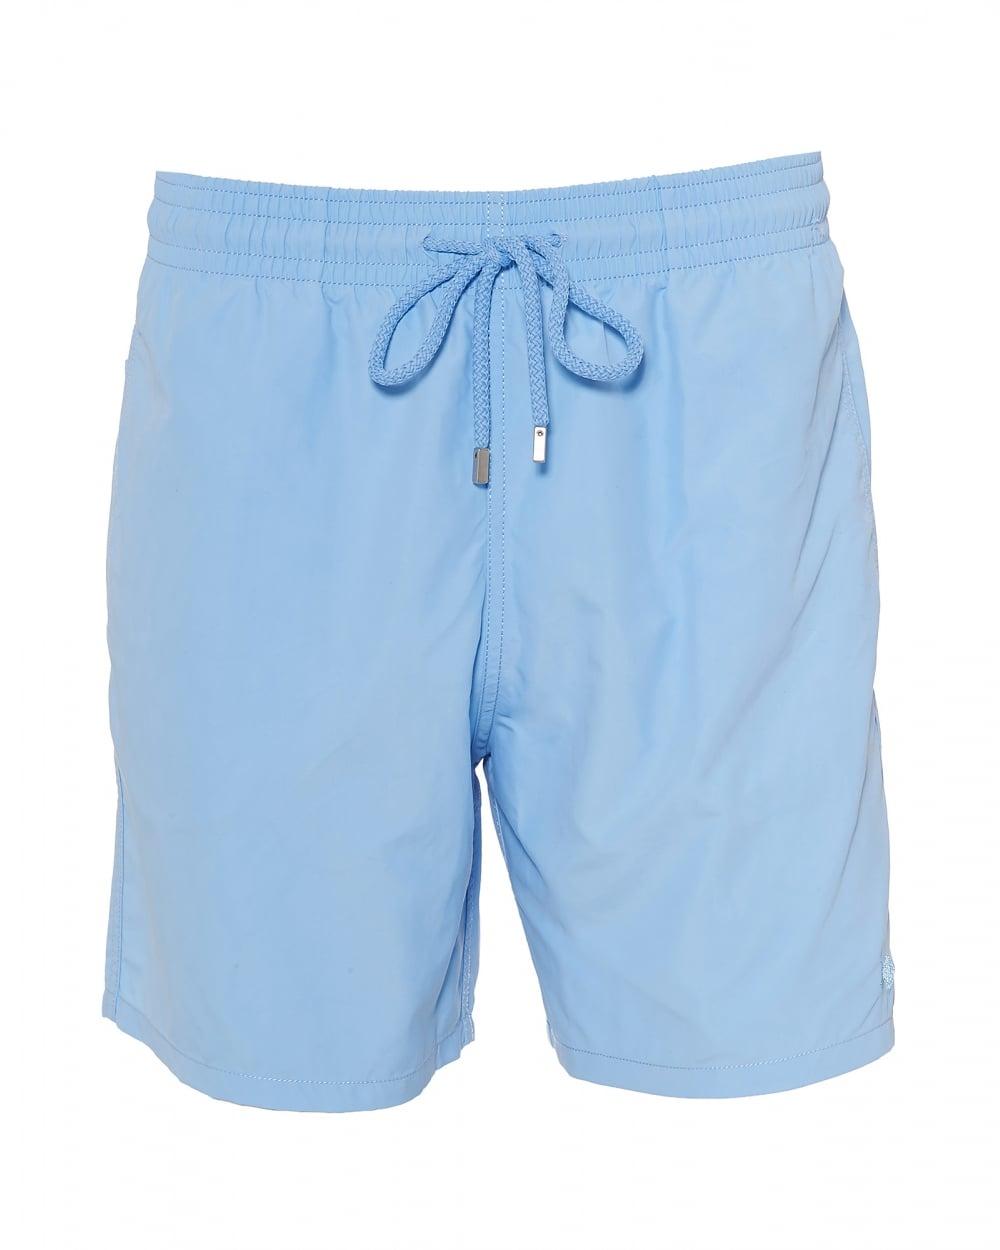 21456ba719 Vilebrequin Mens Moorea Swim Shorts, Water Reactive Blue Swimming Trun